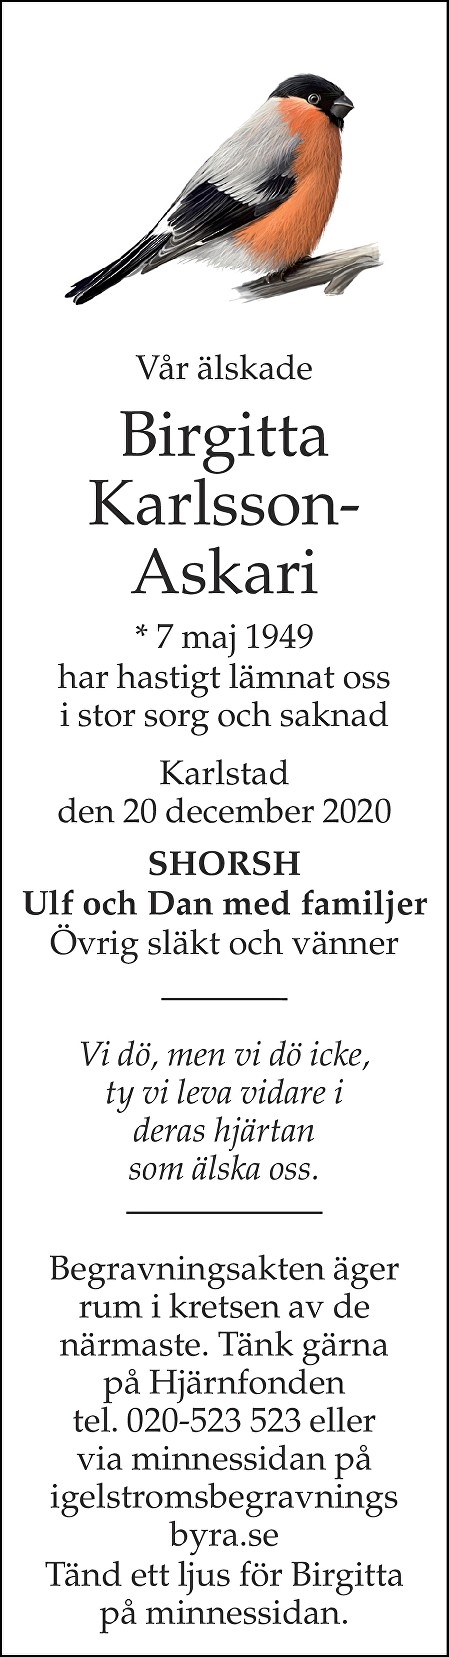 Birgitta Karlsson-Askari Death notice